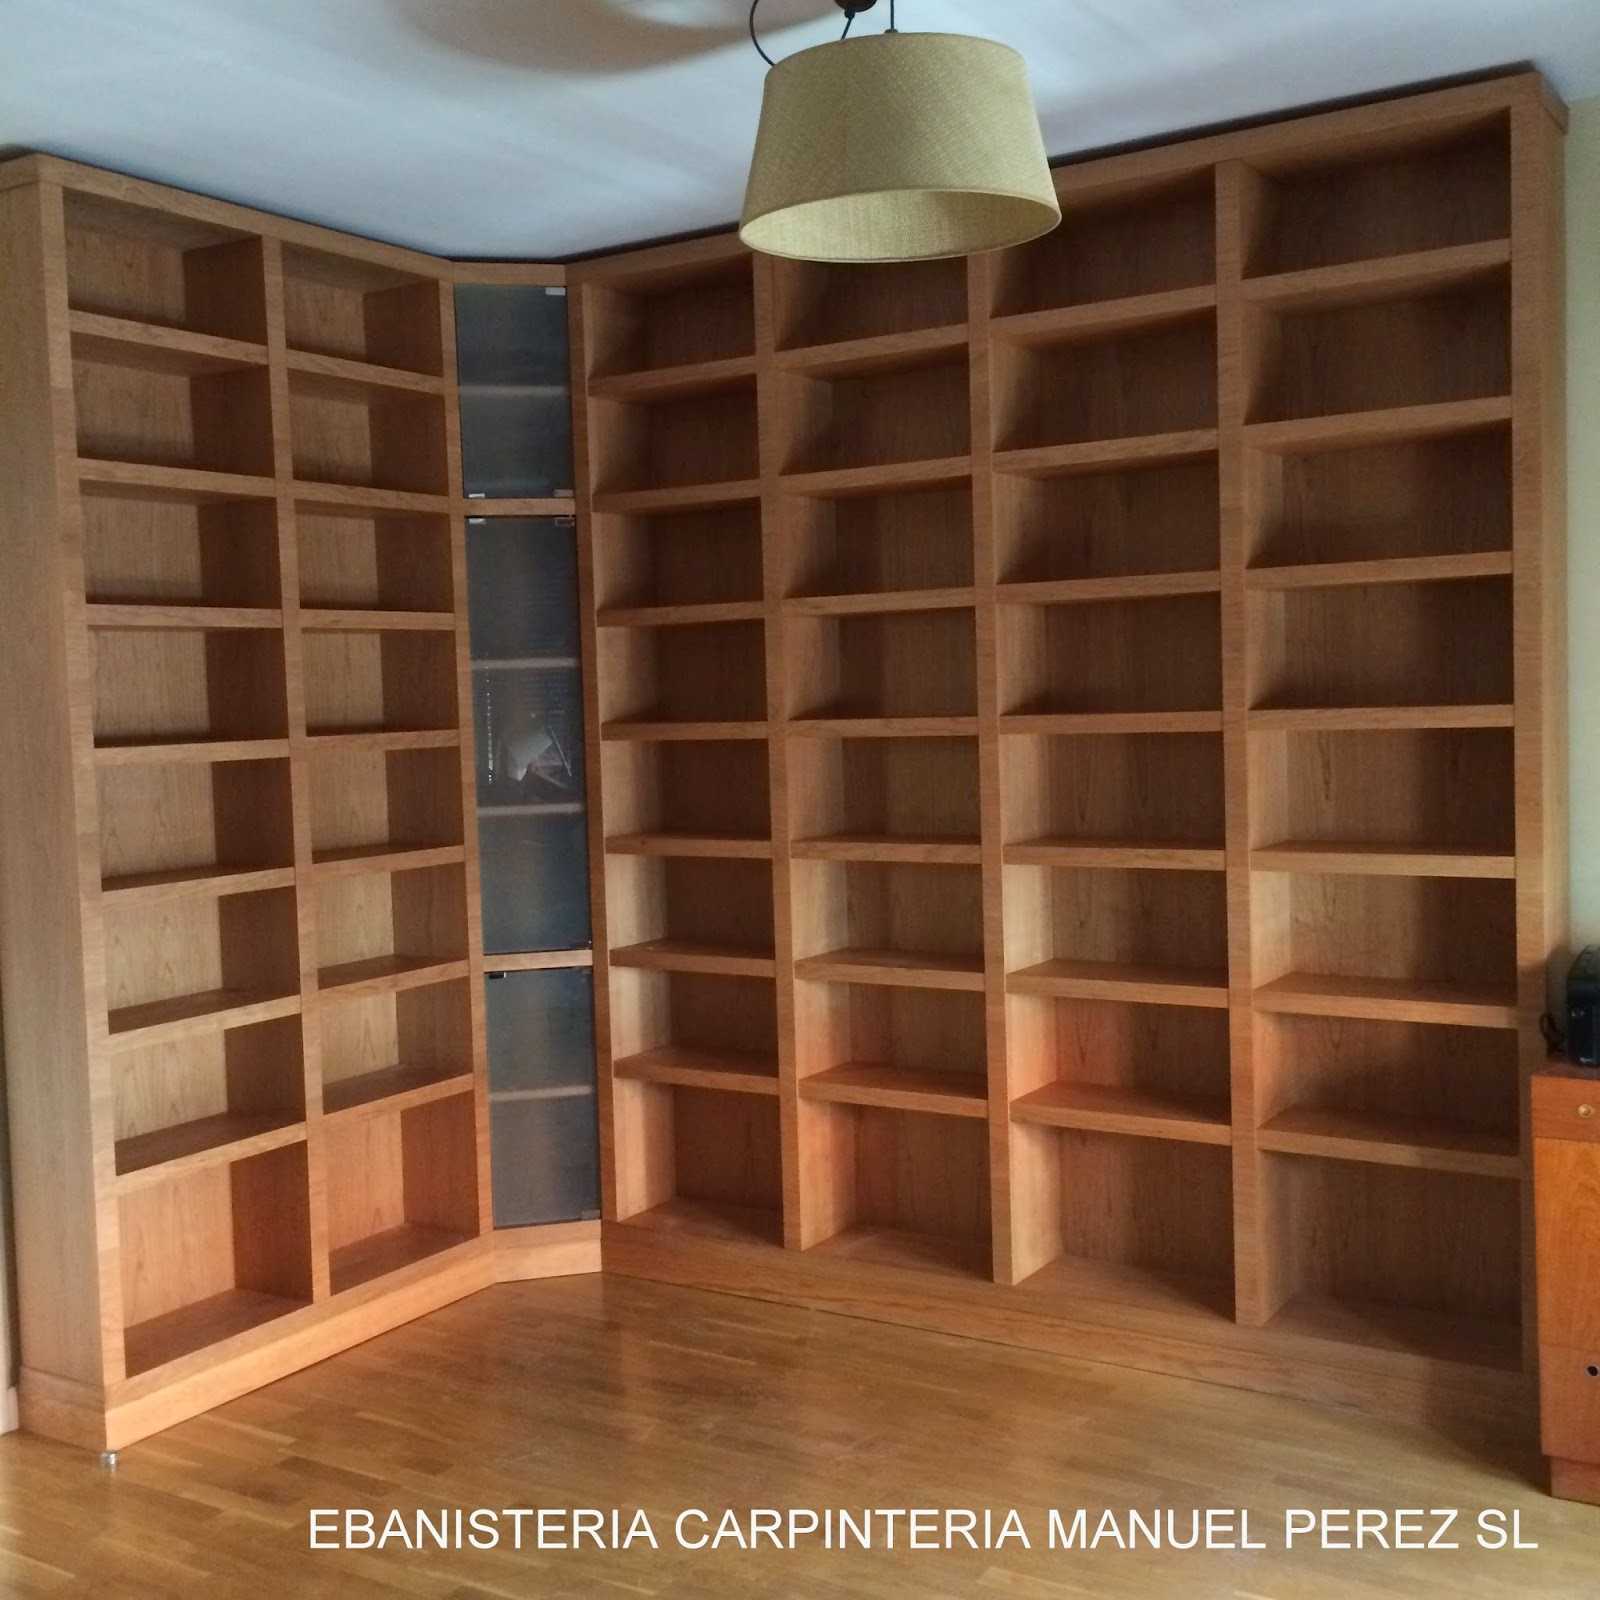 Ebanisteria carpinteria manuel perez zaragoza libreria a medida en madera maciza de cerezo - Madera a medida ...